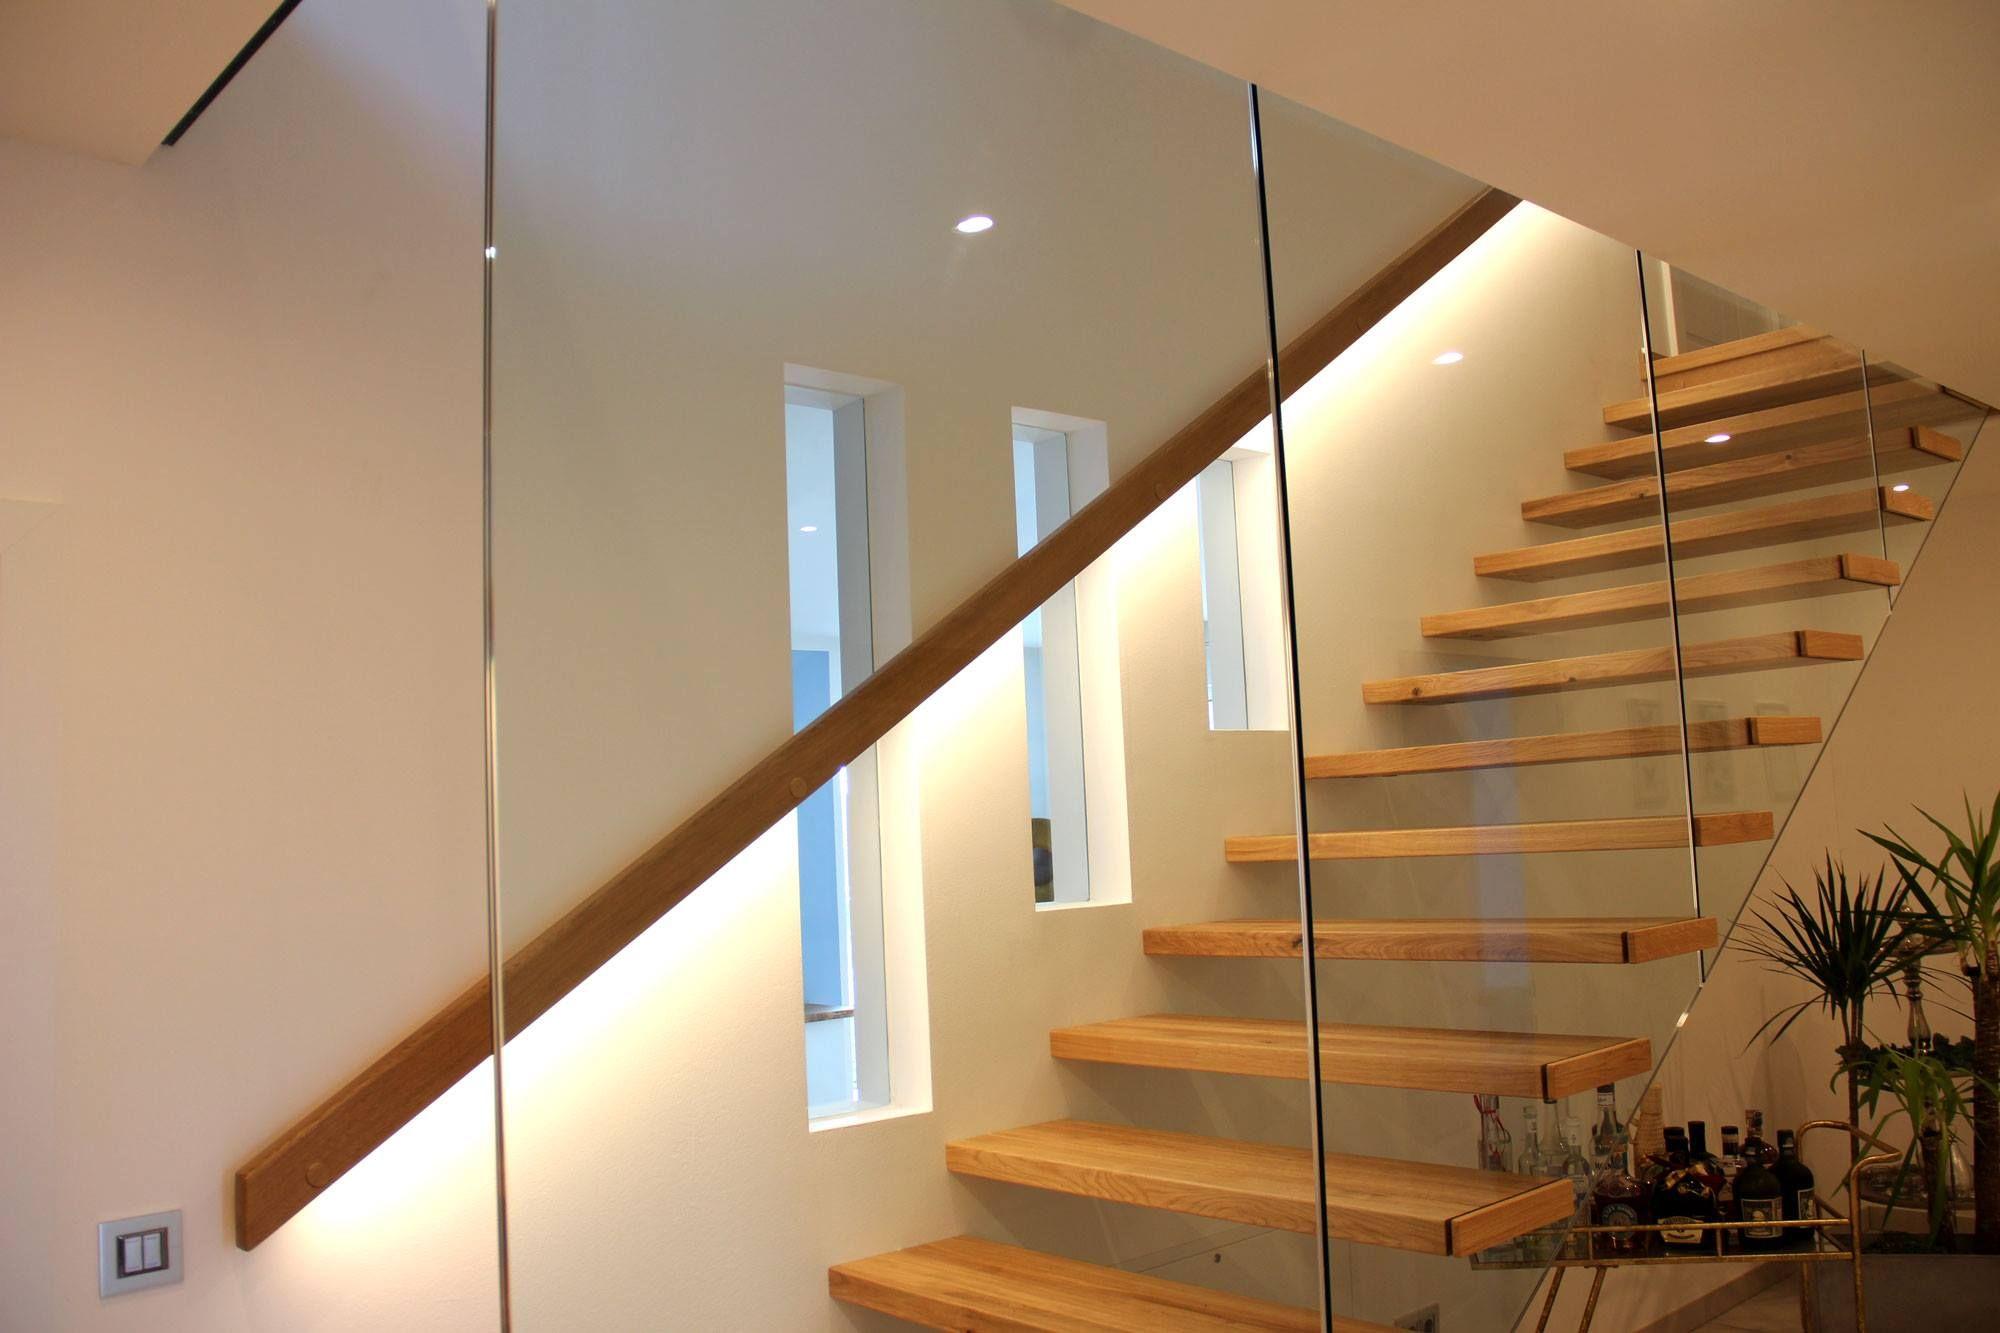 Beleuchtung Im Handlauf Treppenhaus Beleuchtung Treppenbeleuchtung Beleuchtung